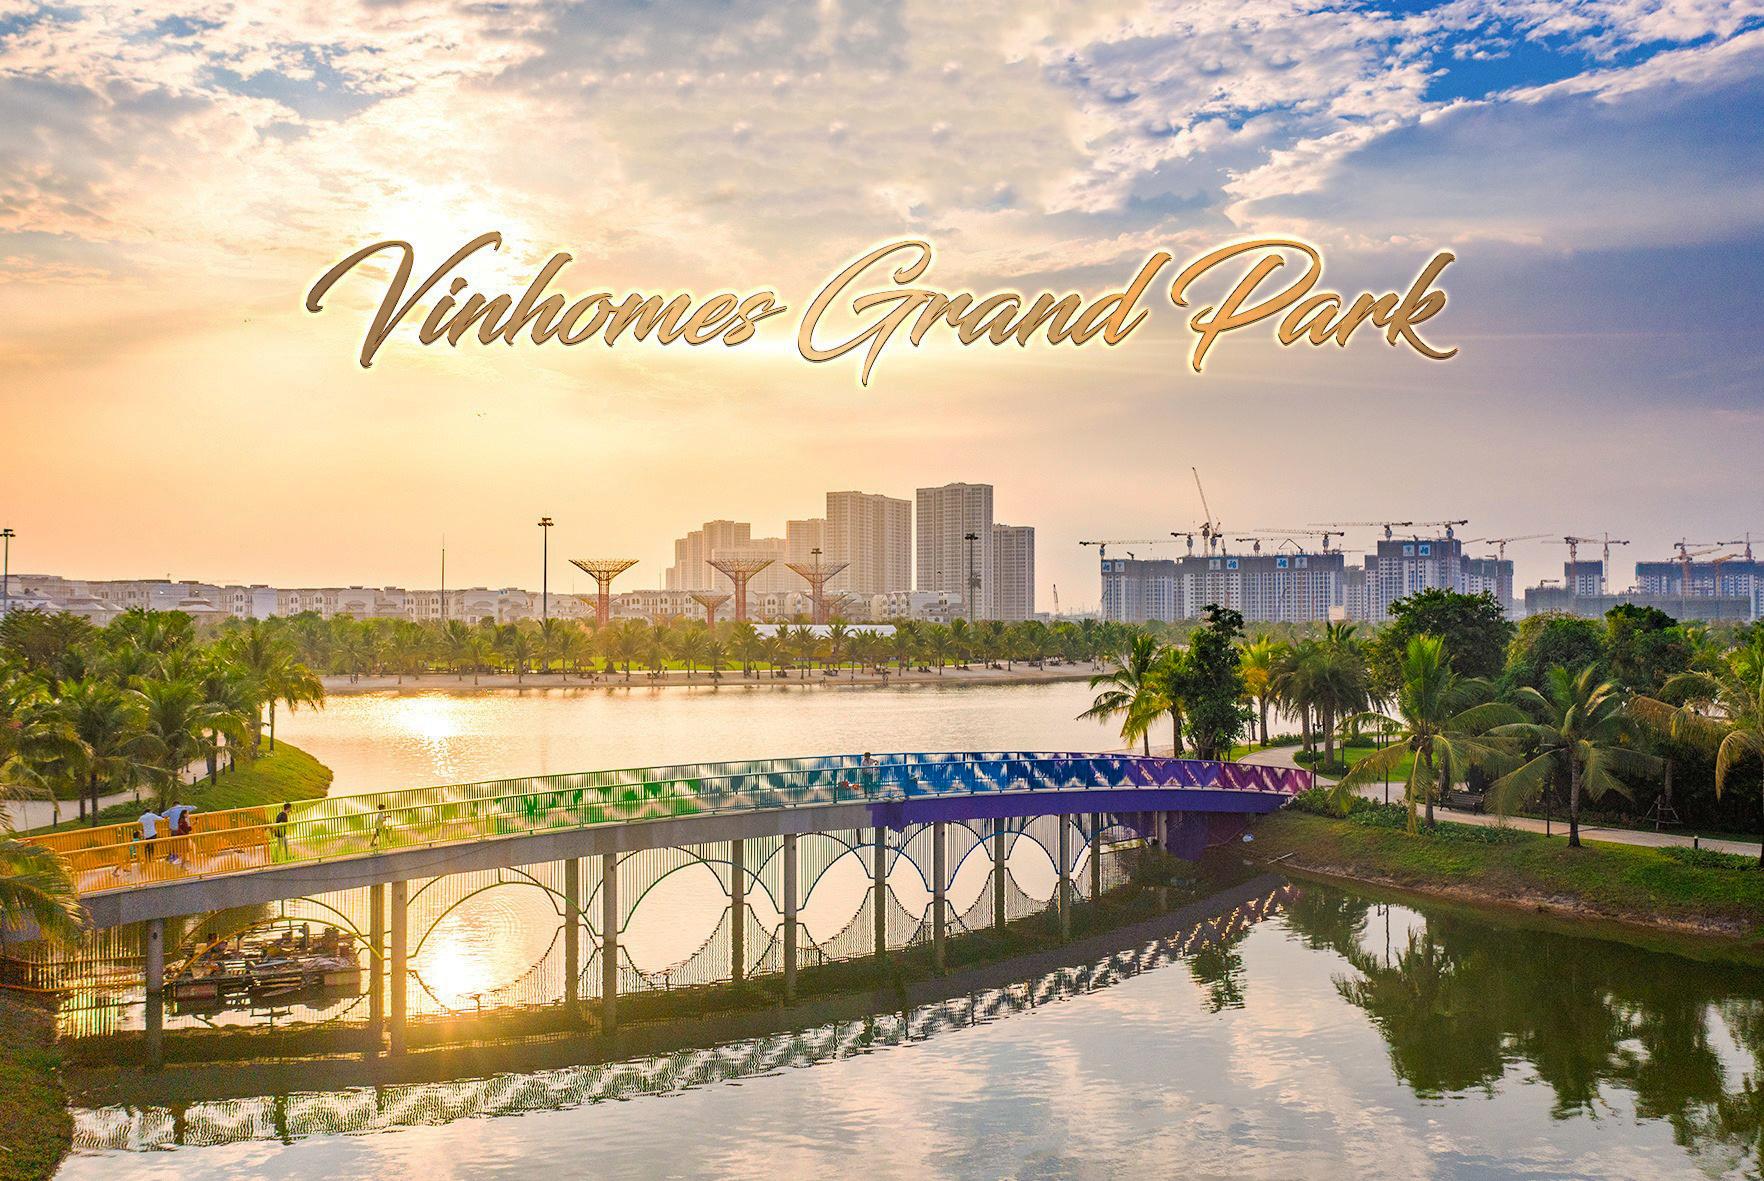 Tiến độ Vinhomes Grand Park